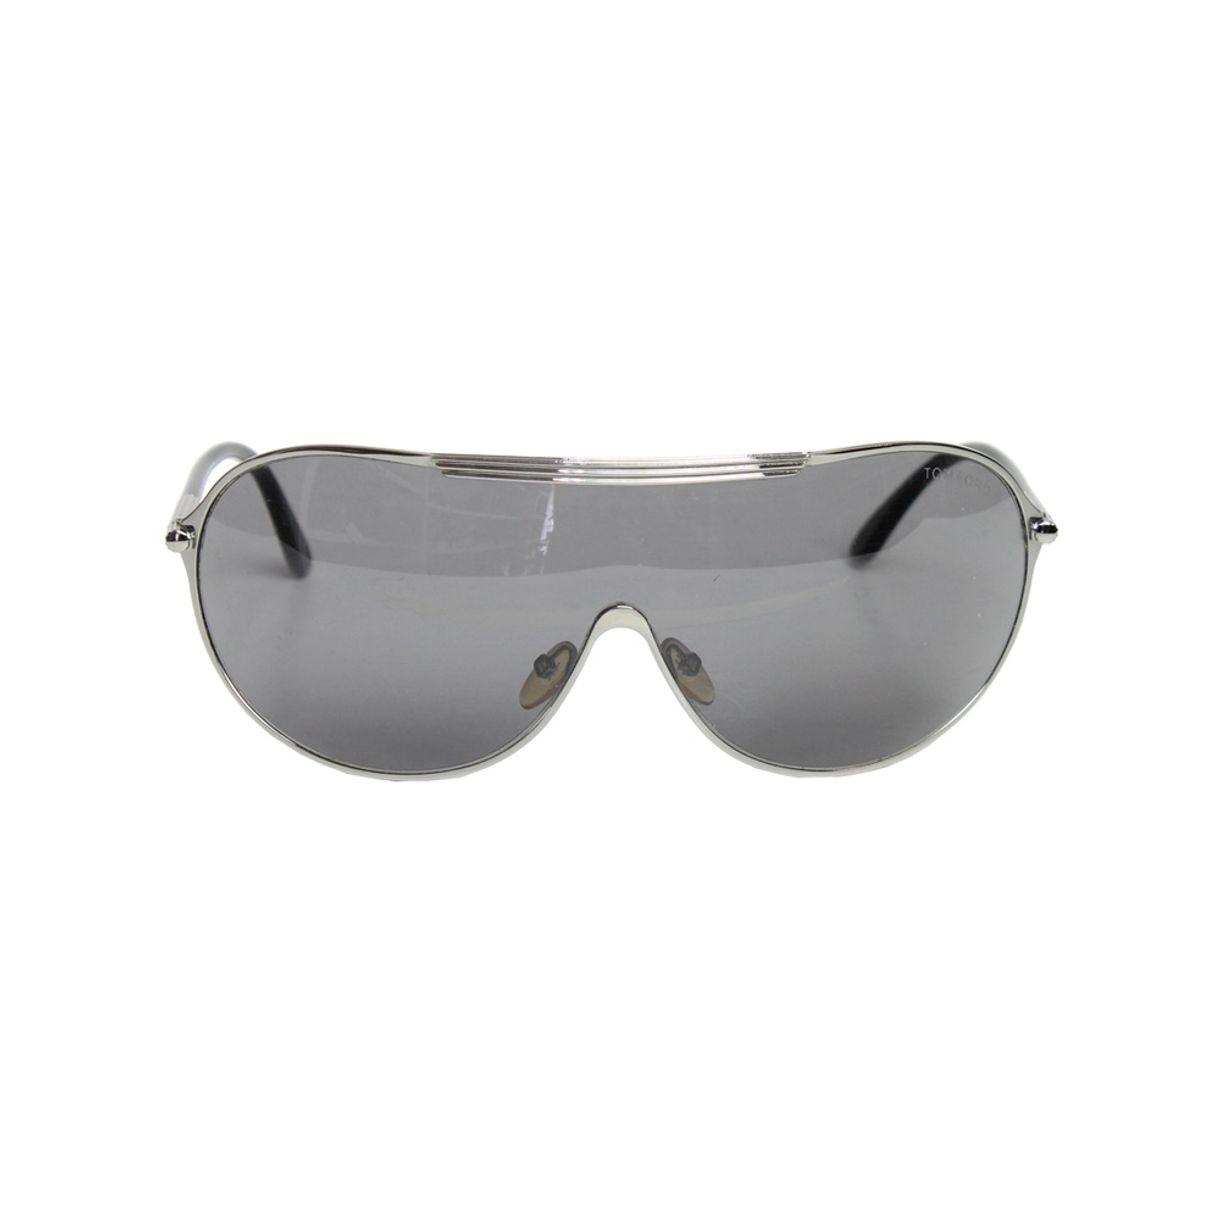 Oculos-Tom-Ford-Aviador-Chumbo